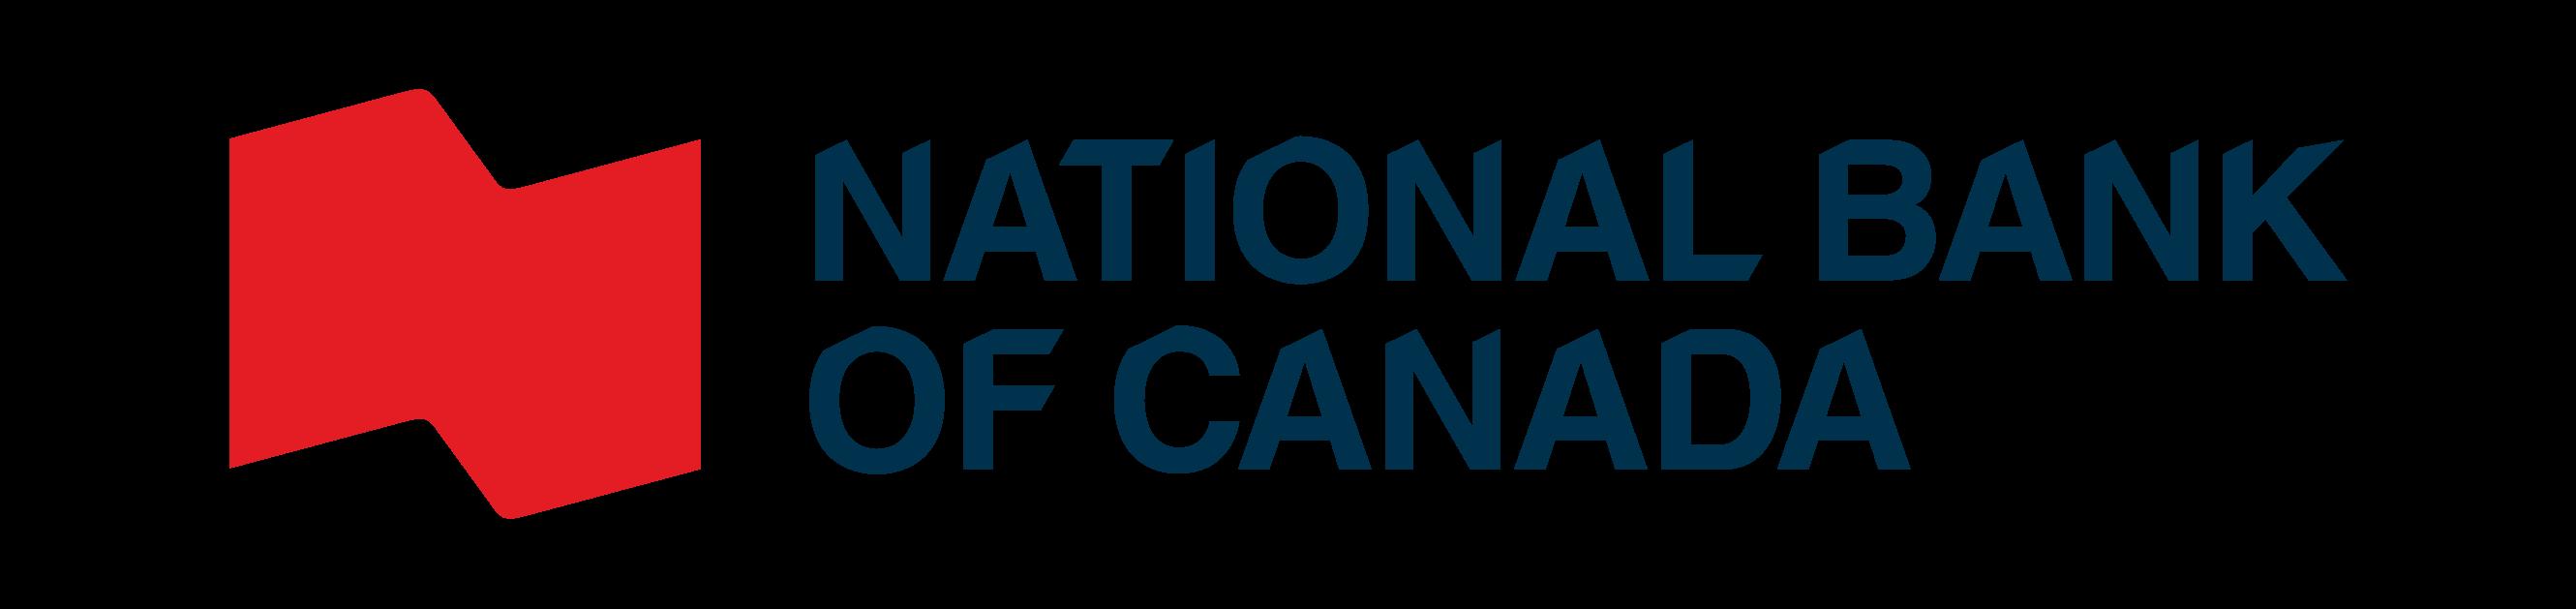 National Bank of Canada-logo